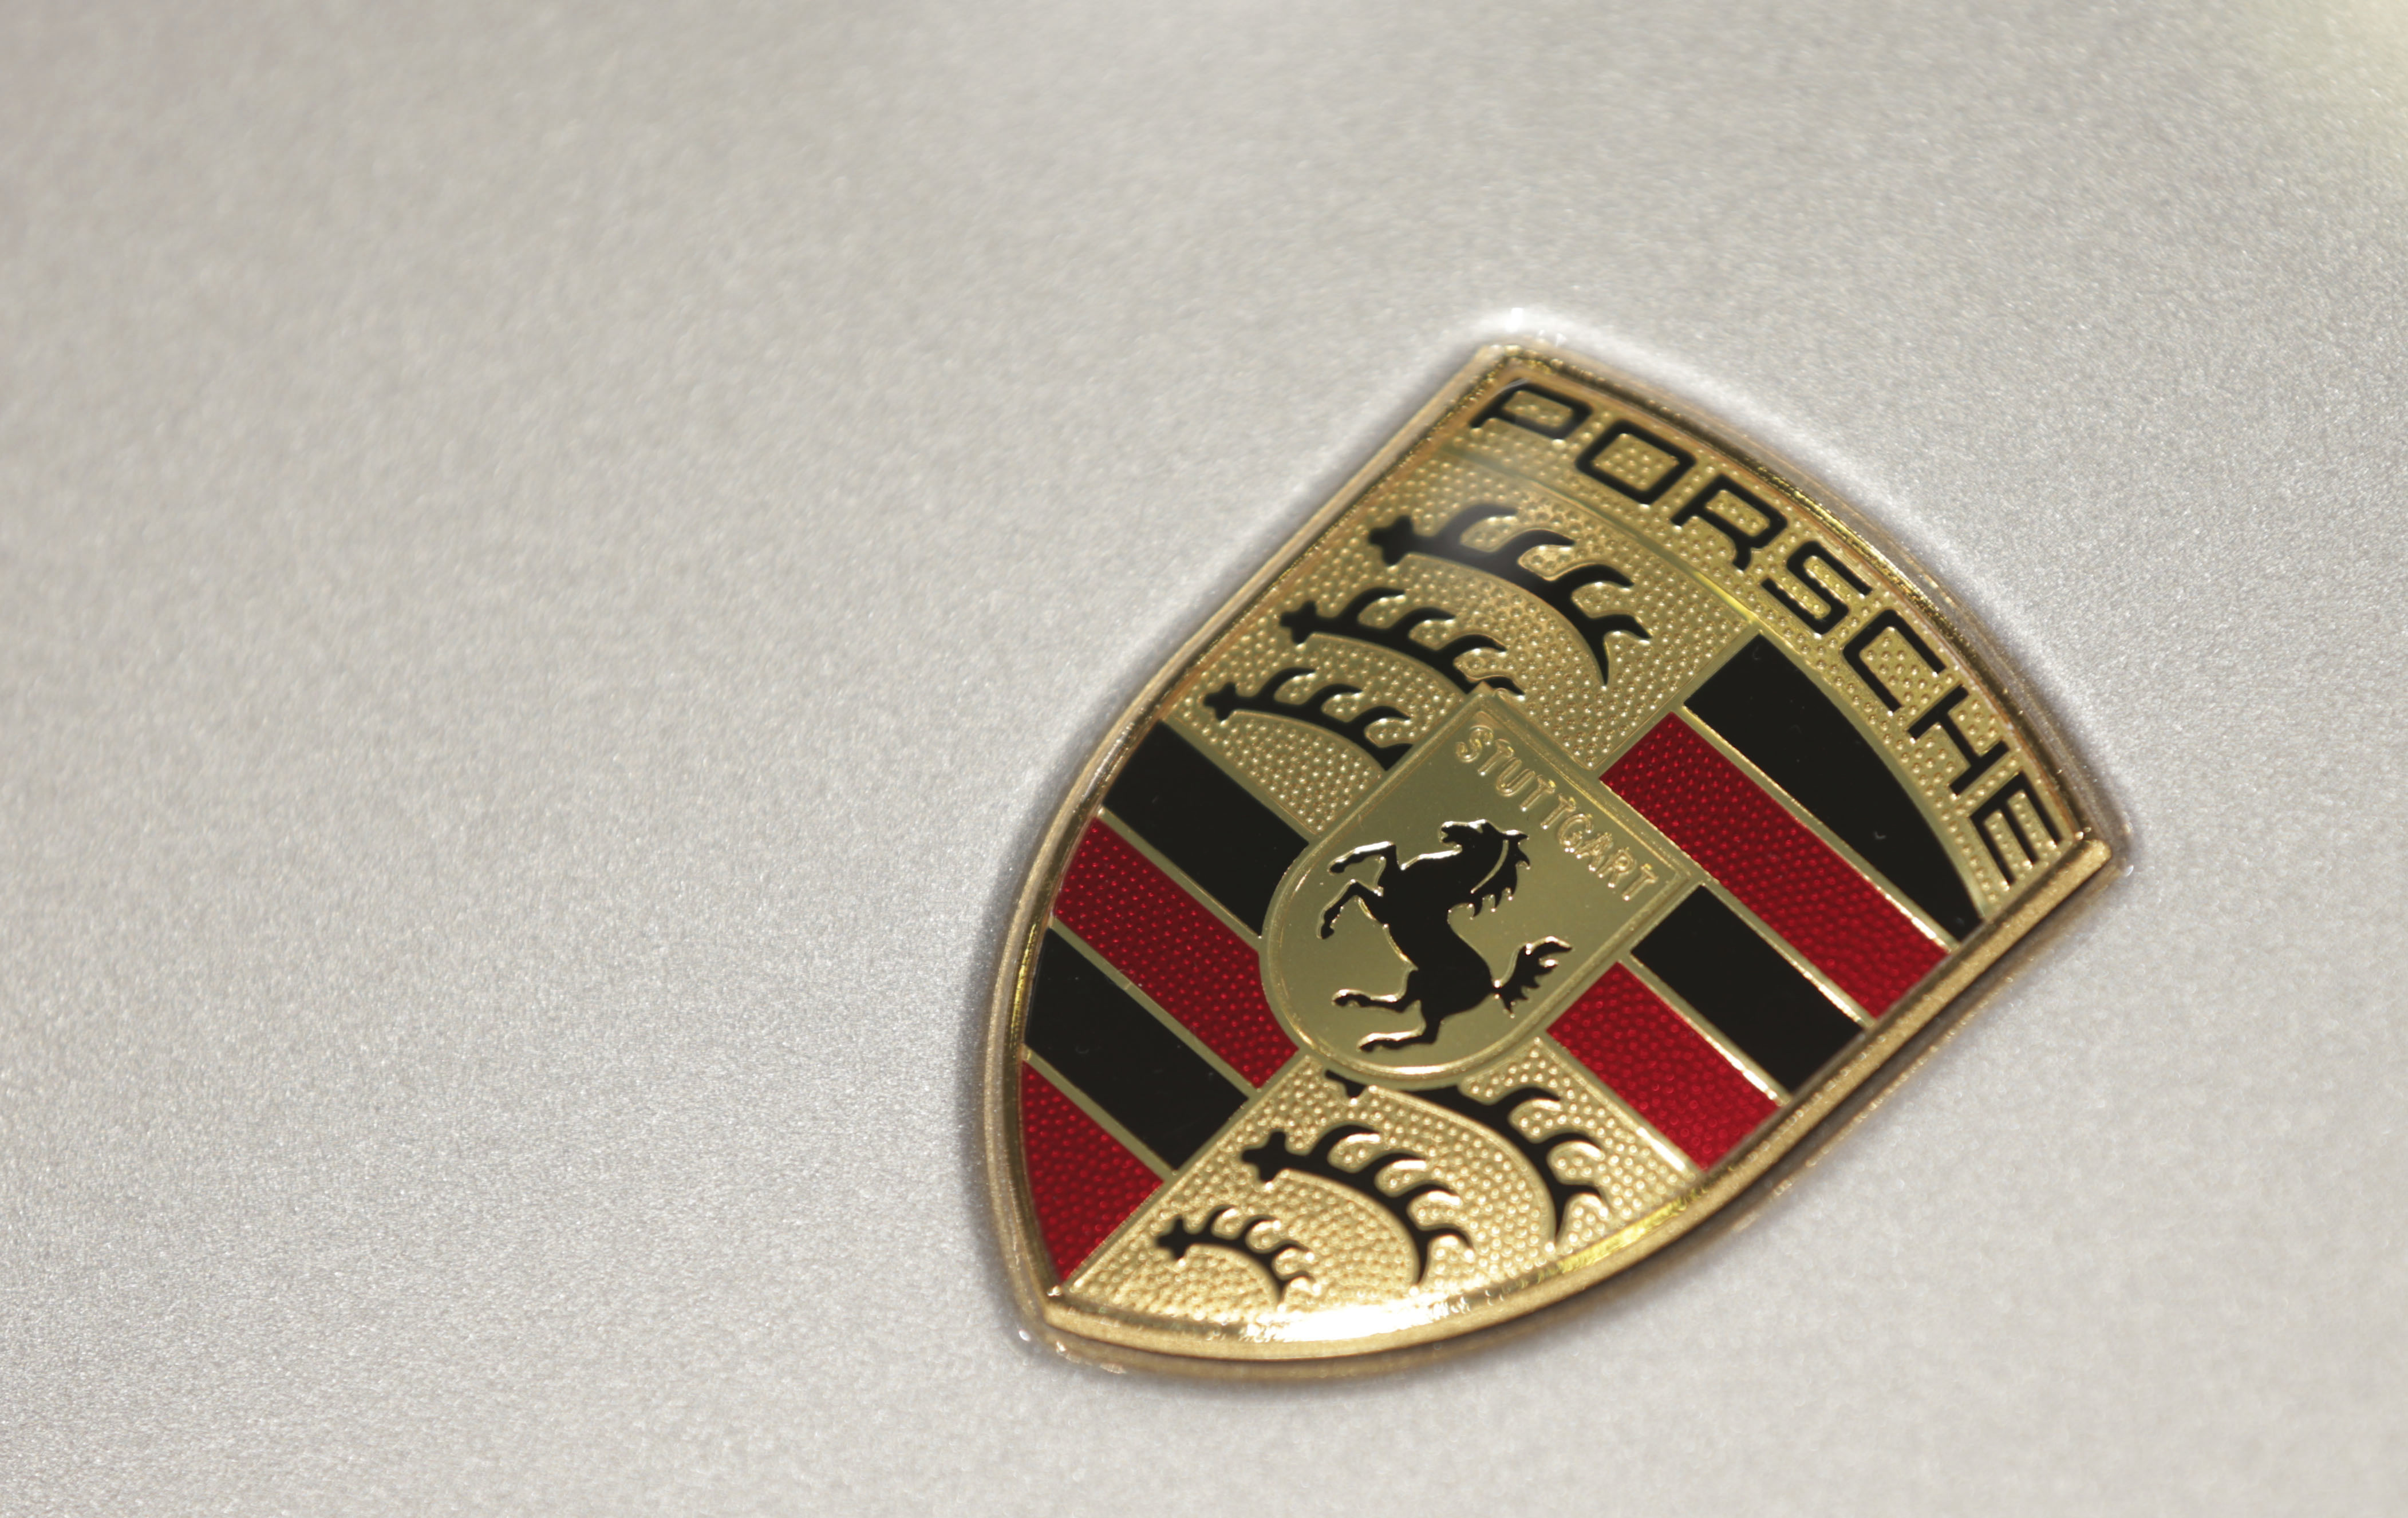 German Prosecutors Probe Porsche Employees Over Diesel Cars